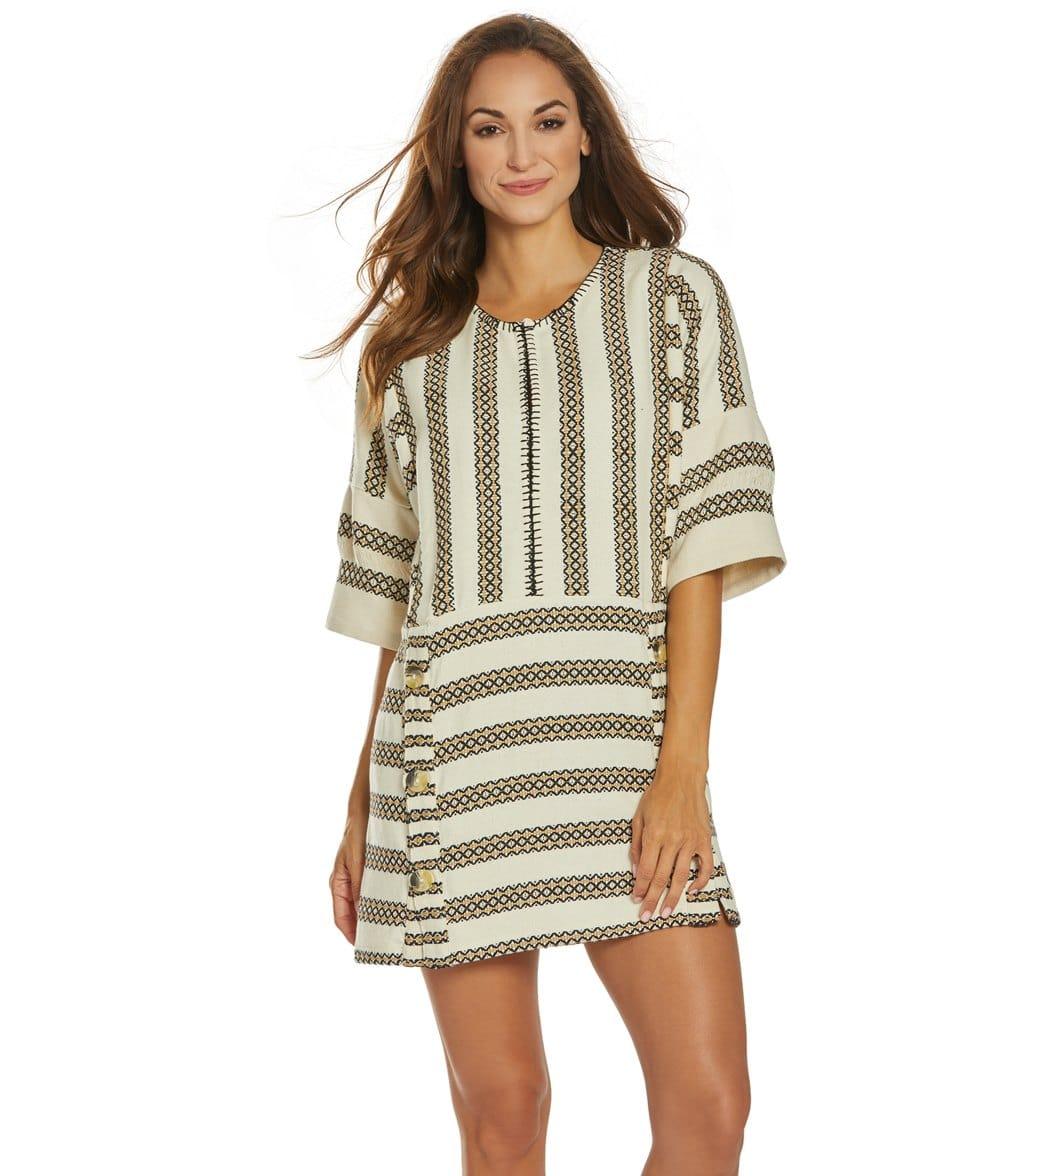 Tigerlily Oasis Smock Dress Cotton